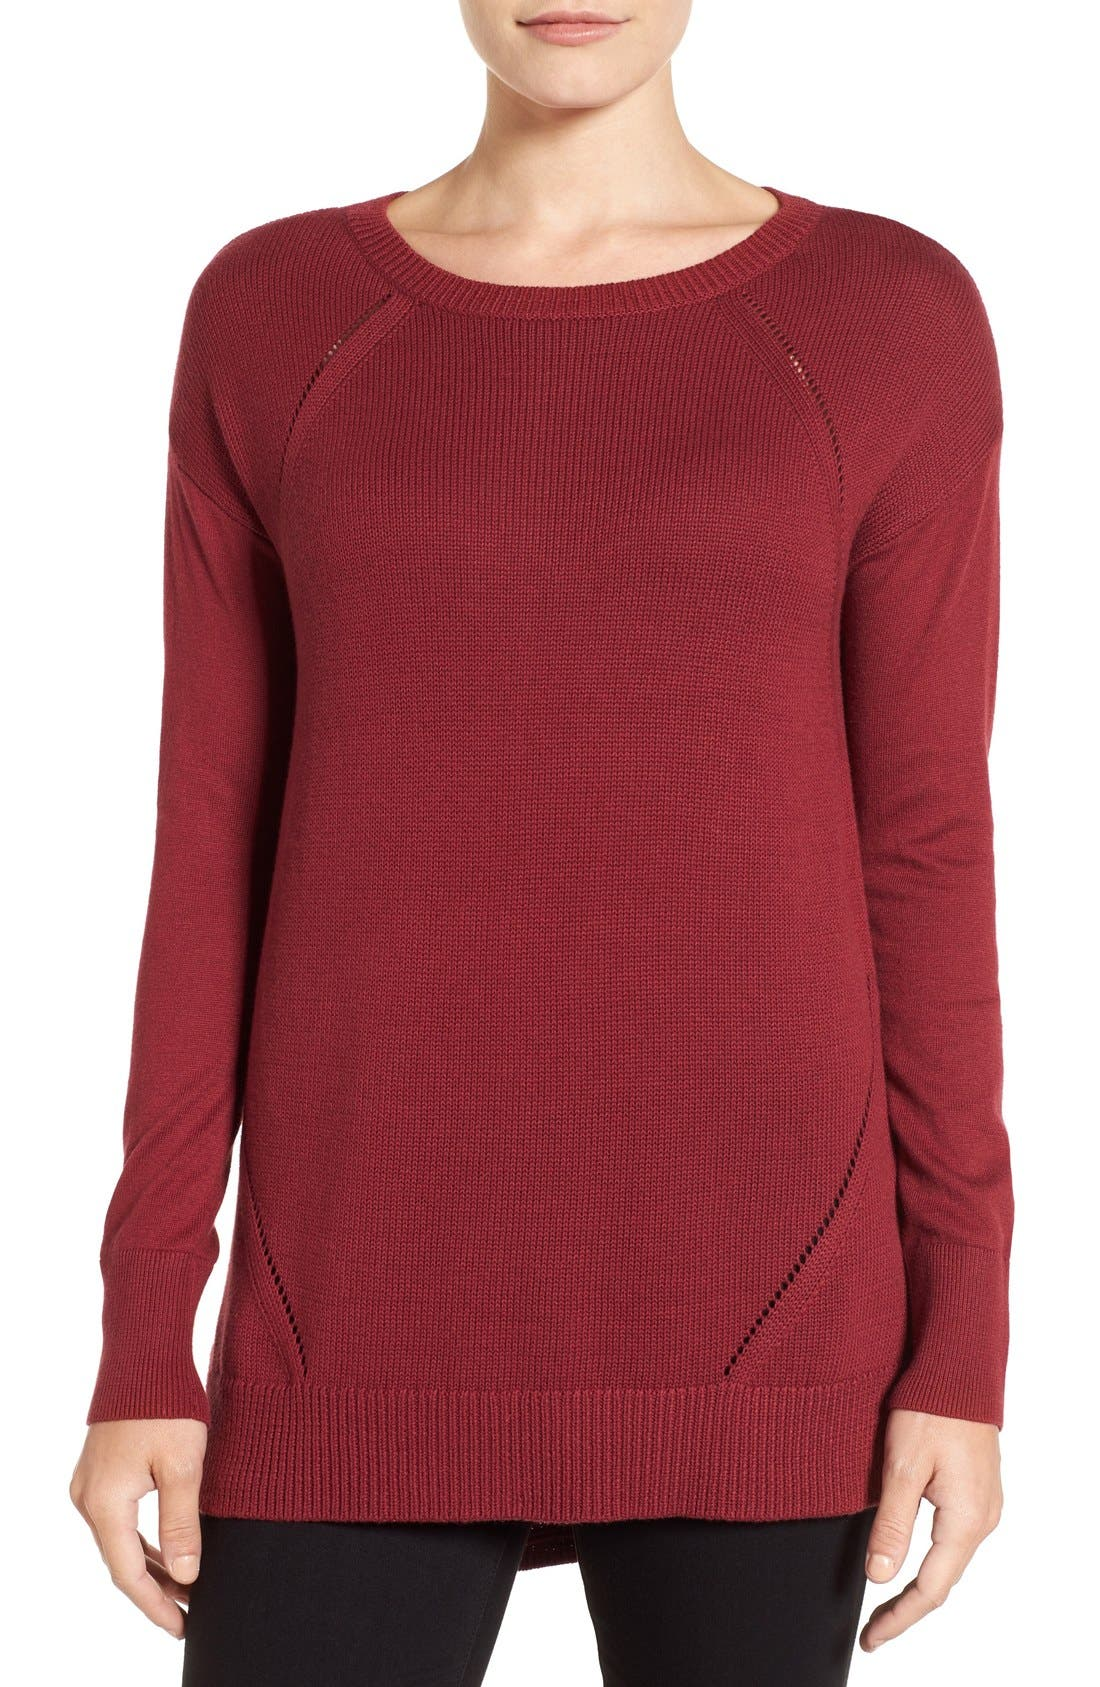 Alternate Image 1 Selected - Caslon® Button Back Tunic Sweater (Regular & Petite)